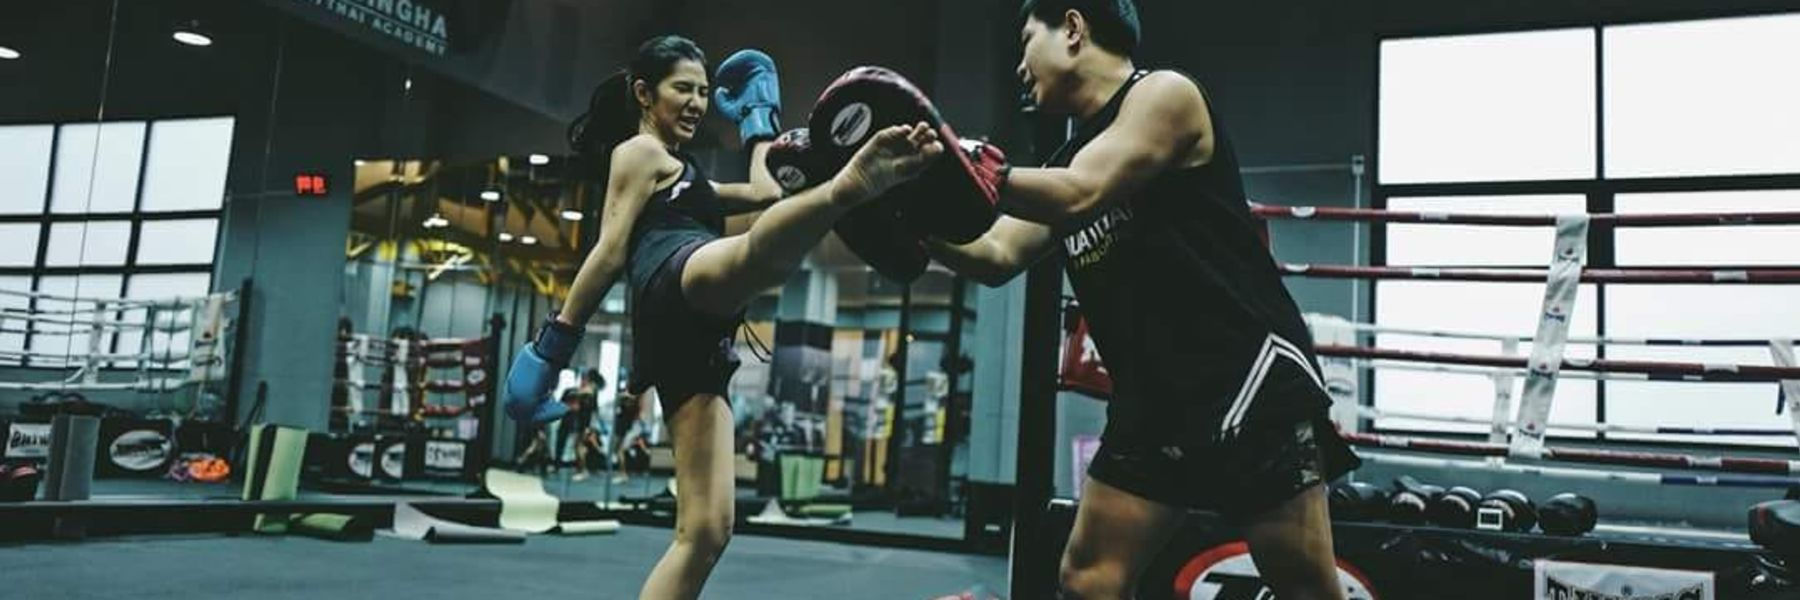 RSM Academy (Muay Thai) - Asoke image